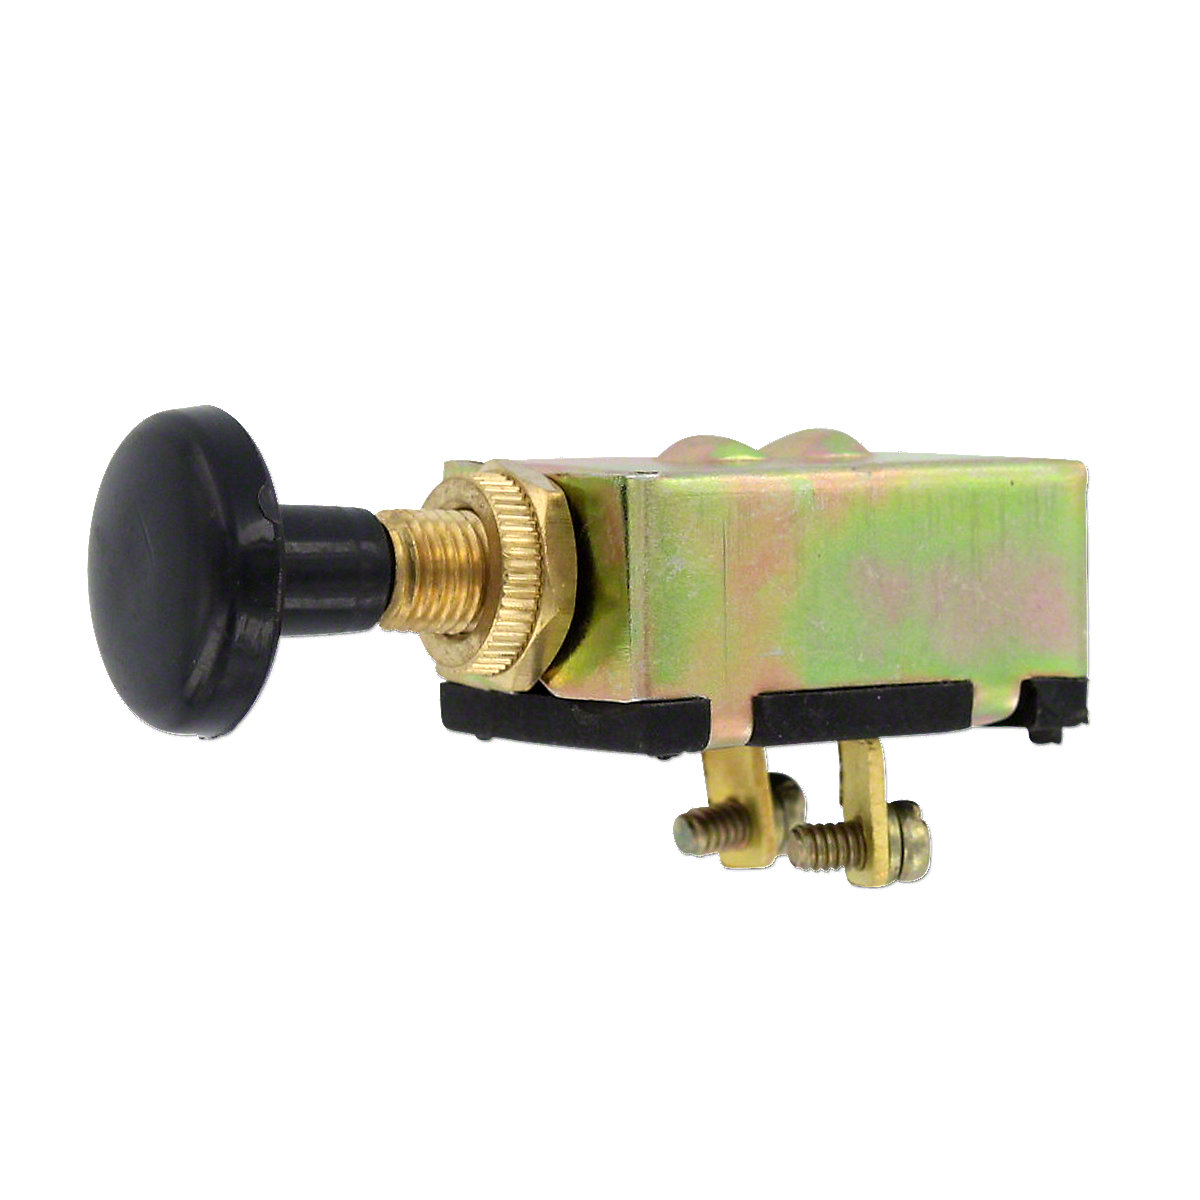 Universal 2 Position Push Pull Light Switch For Massey Harris and Massey Ferguson Tractors.